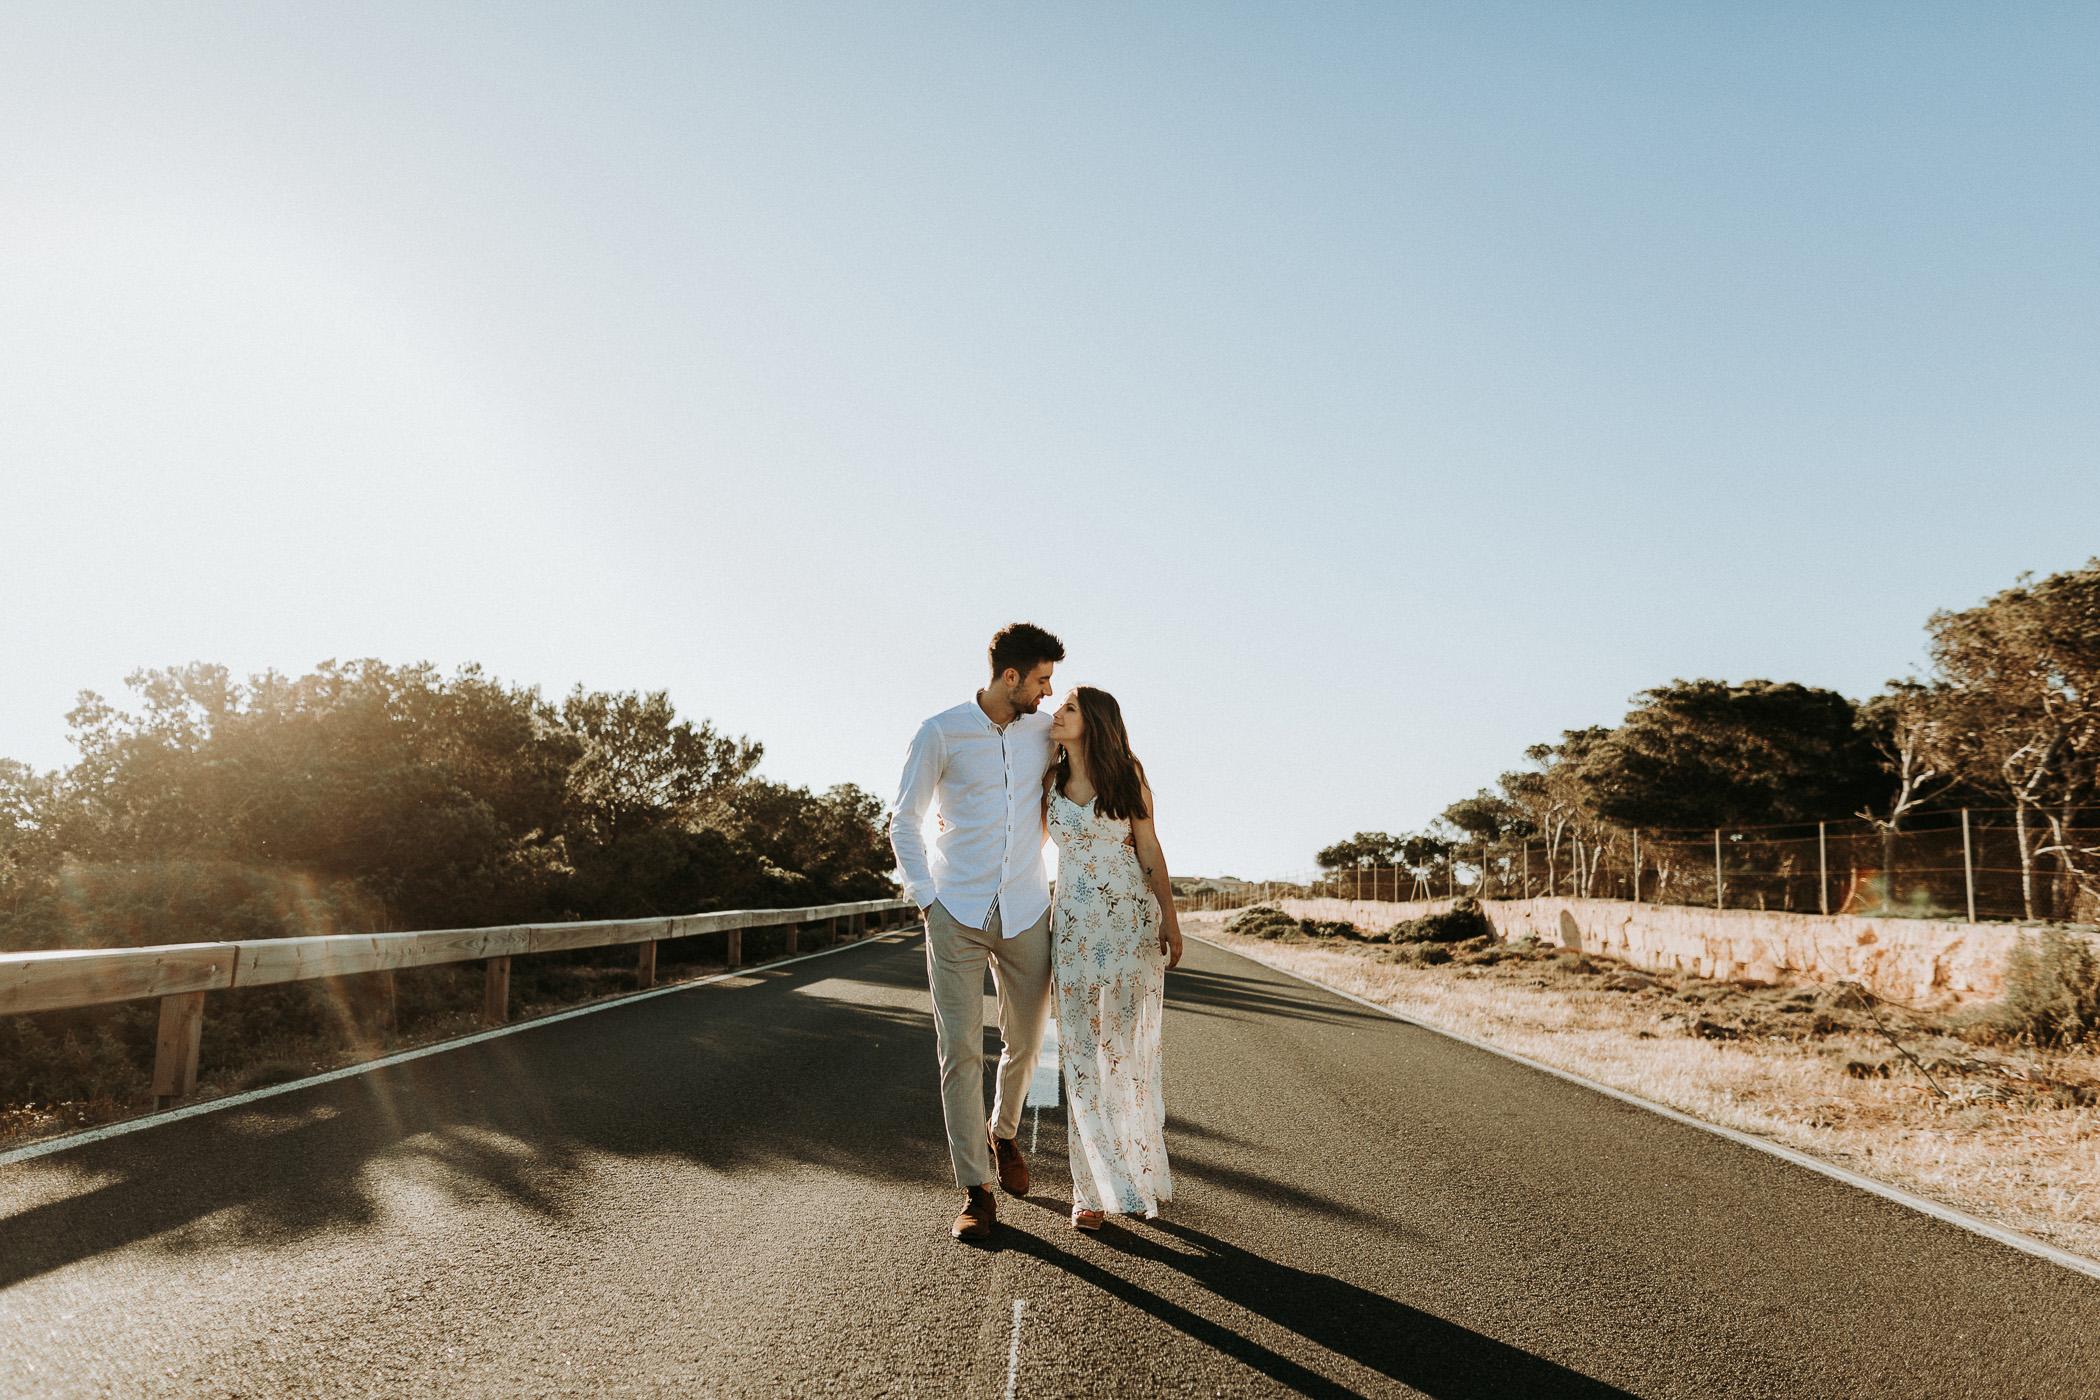 DanielaMarquardtPhotography_wedding_elopement_mallorca_spain_calapi_palma_lauraandtoni_403